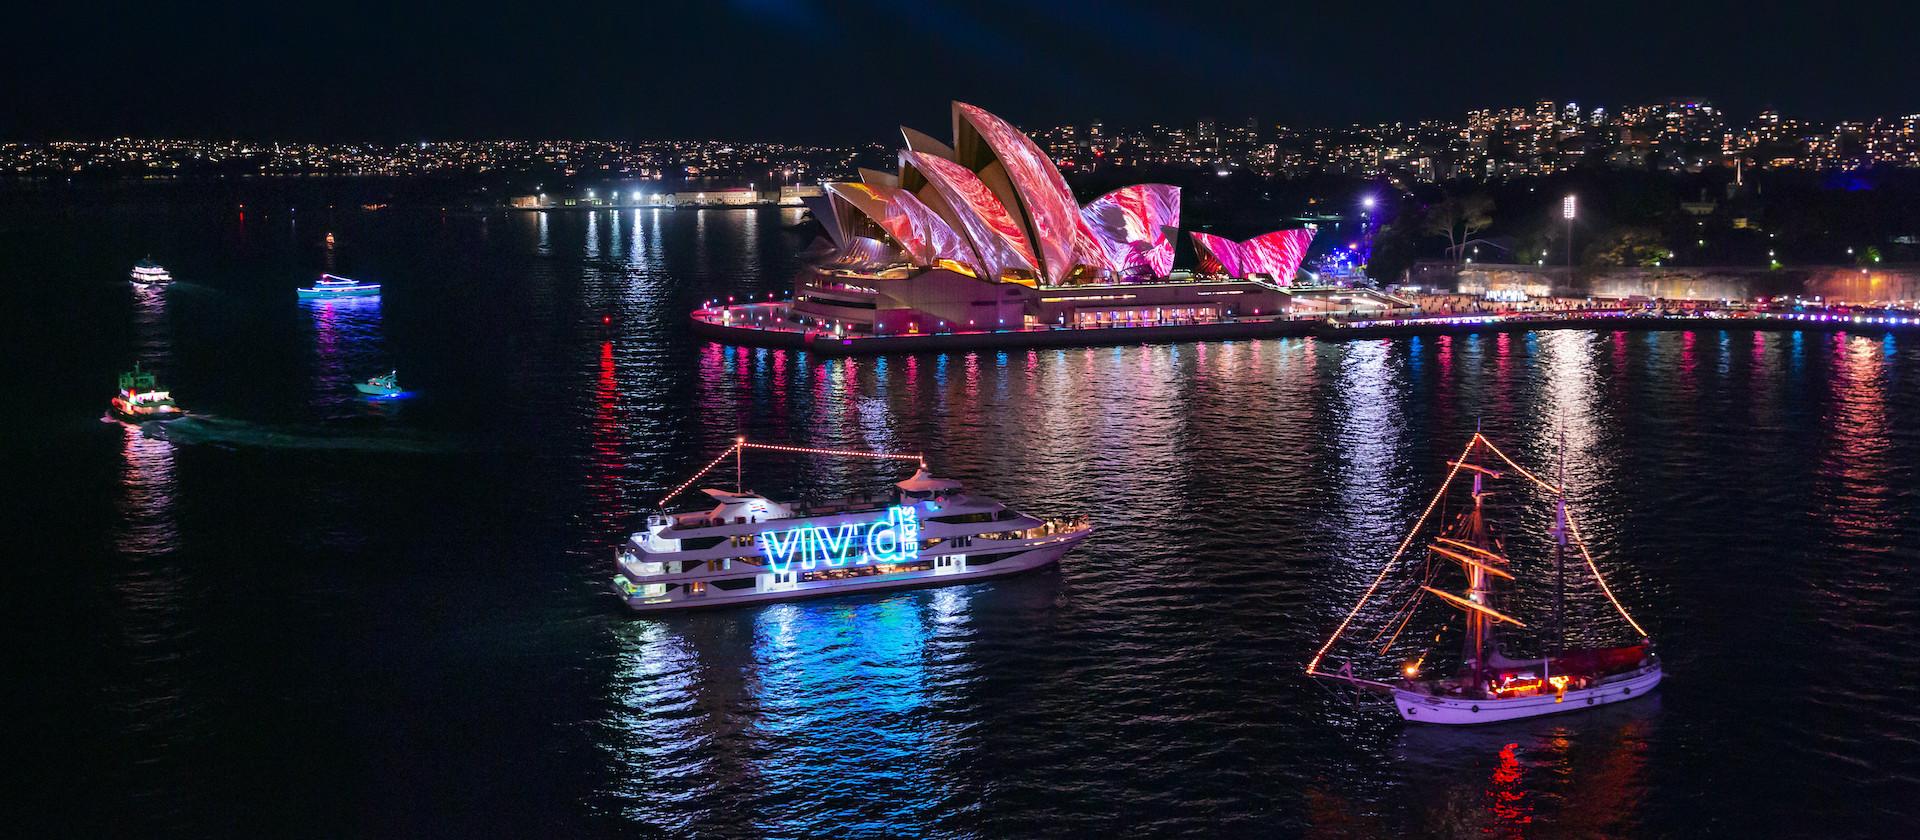 Vivid Sydney & Newcastle